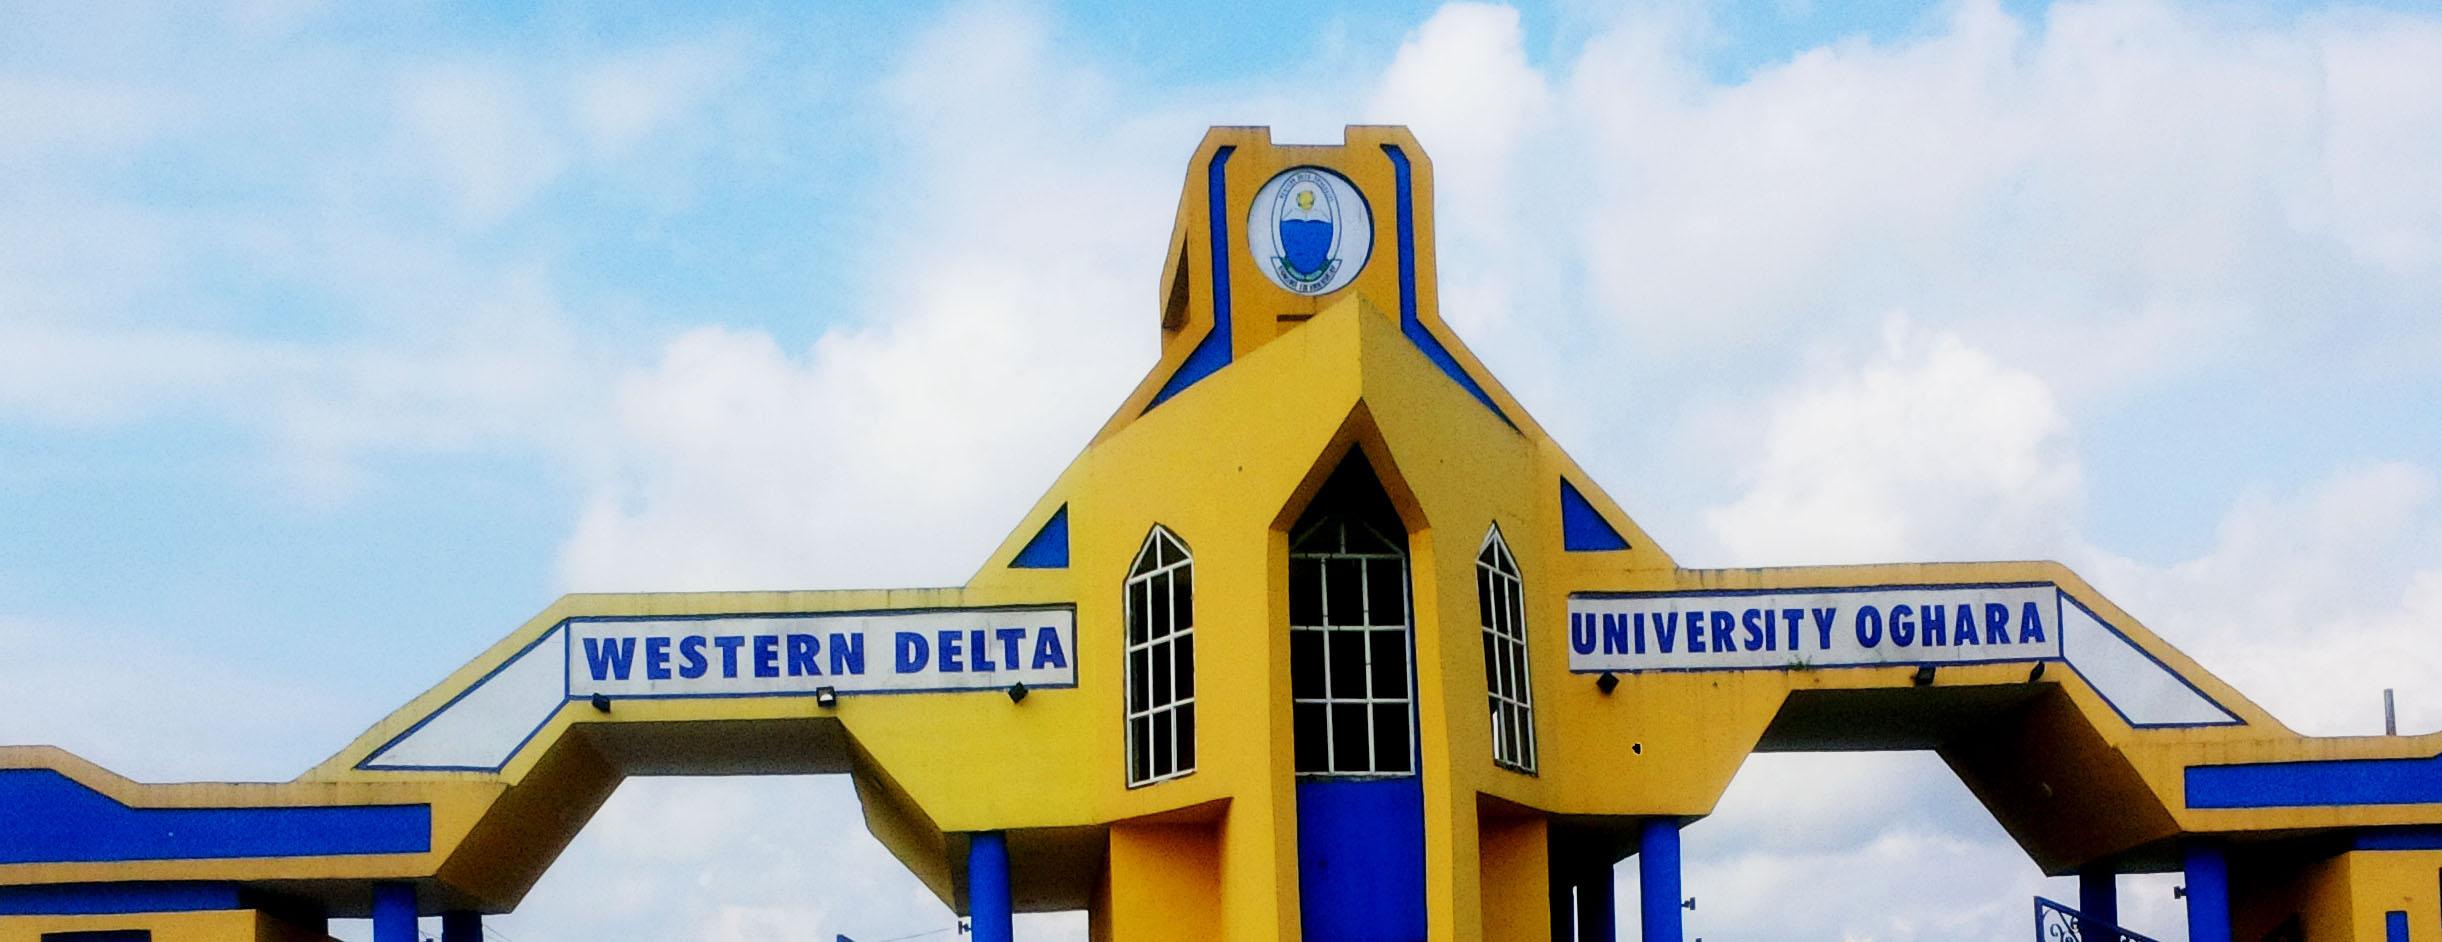 Western Delta Varsity Names Victor Attah, Ex-A'Ibom Gov, Chancellor